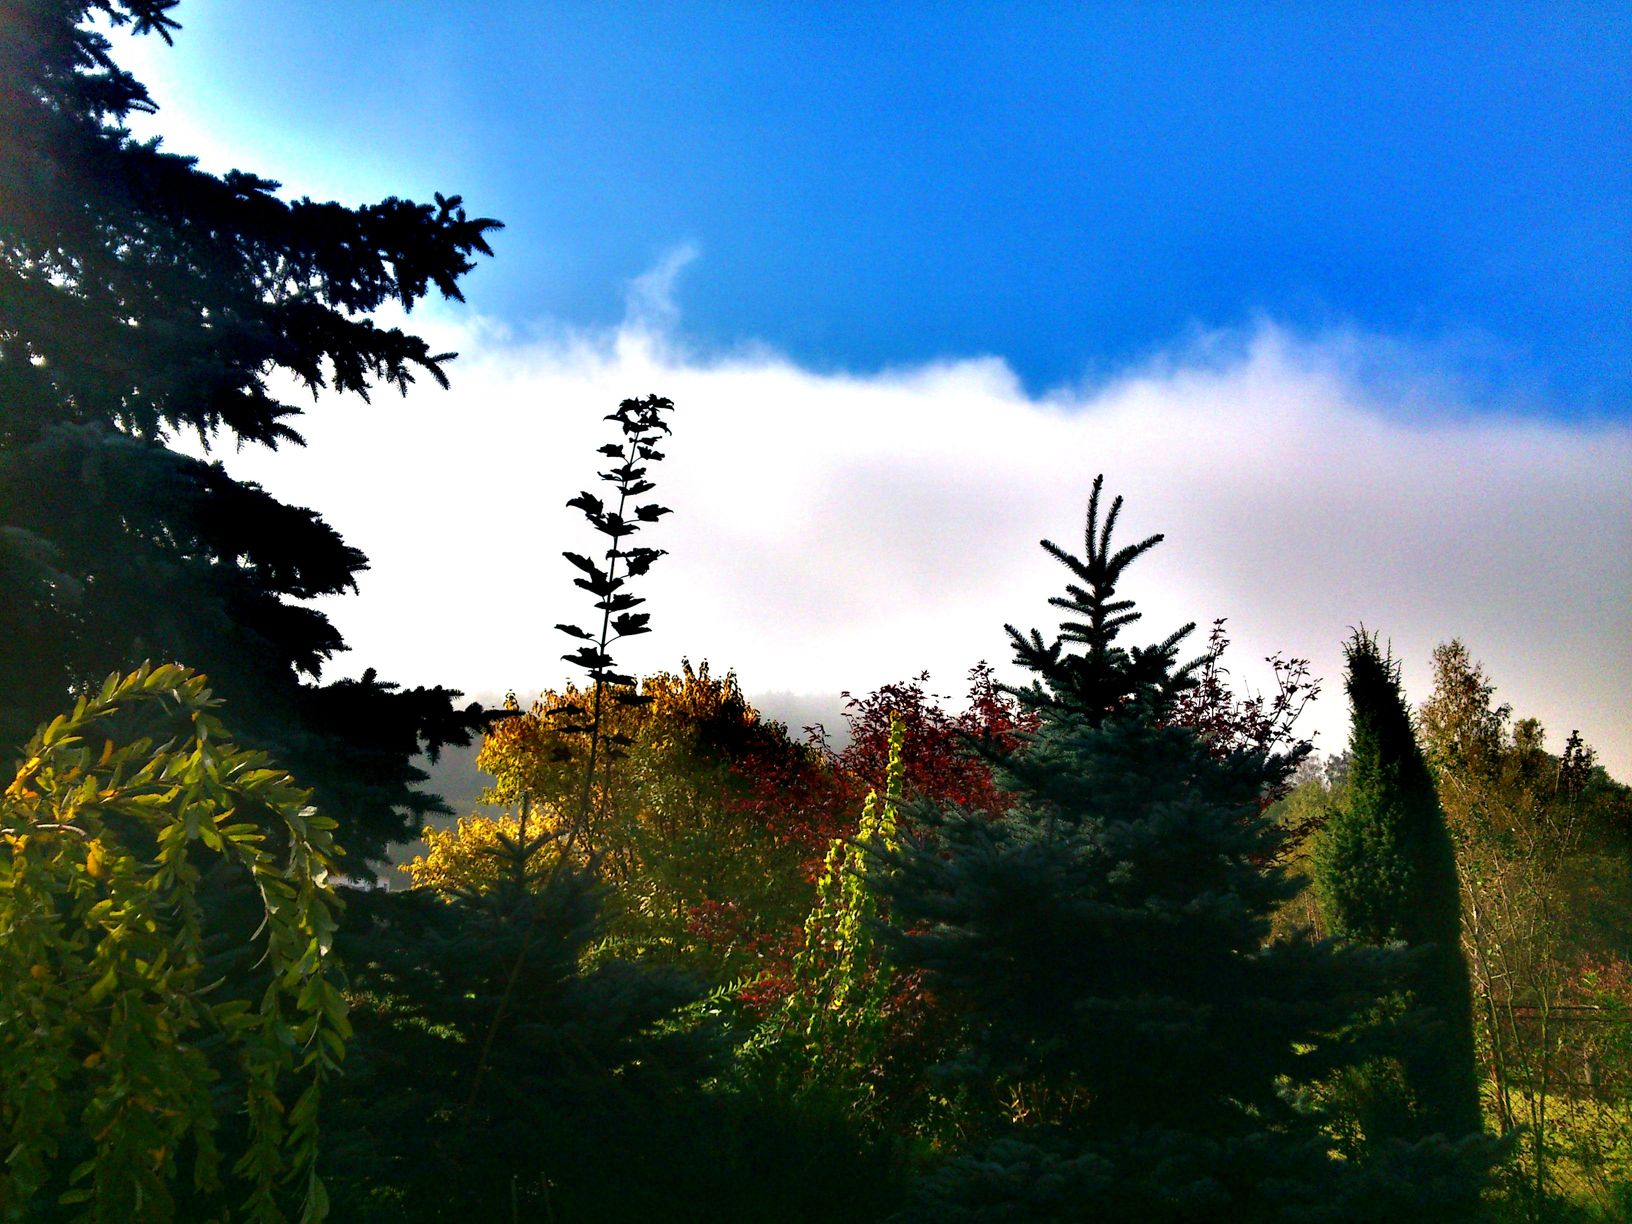 c360_2012-10-03-11-37-52